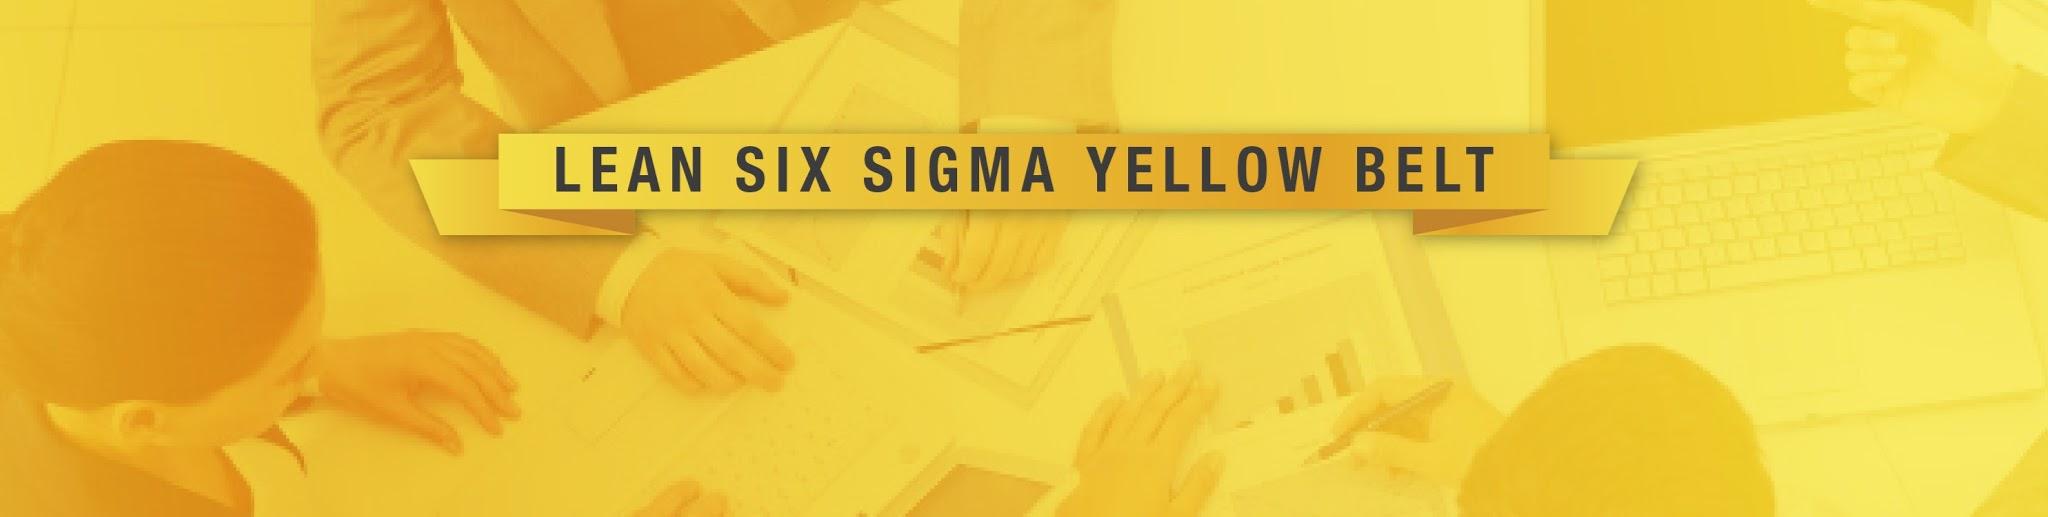 LSS Minnesota- Lean Six Sigma Yellow Belt